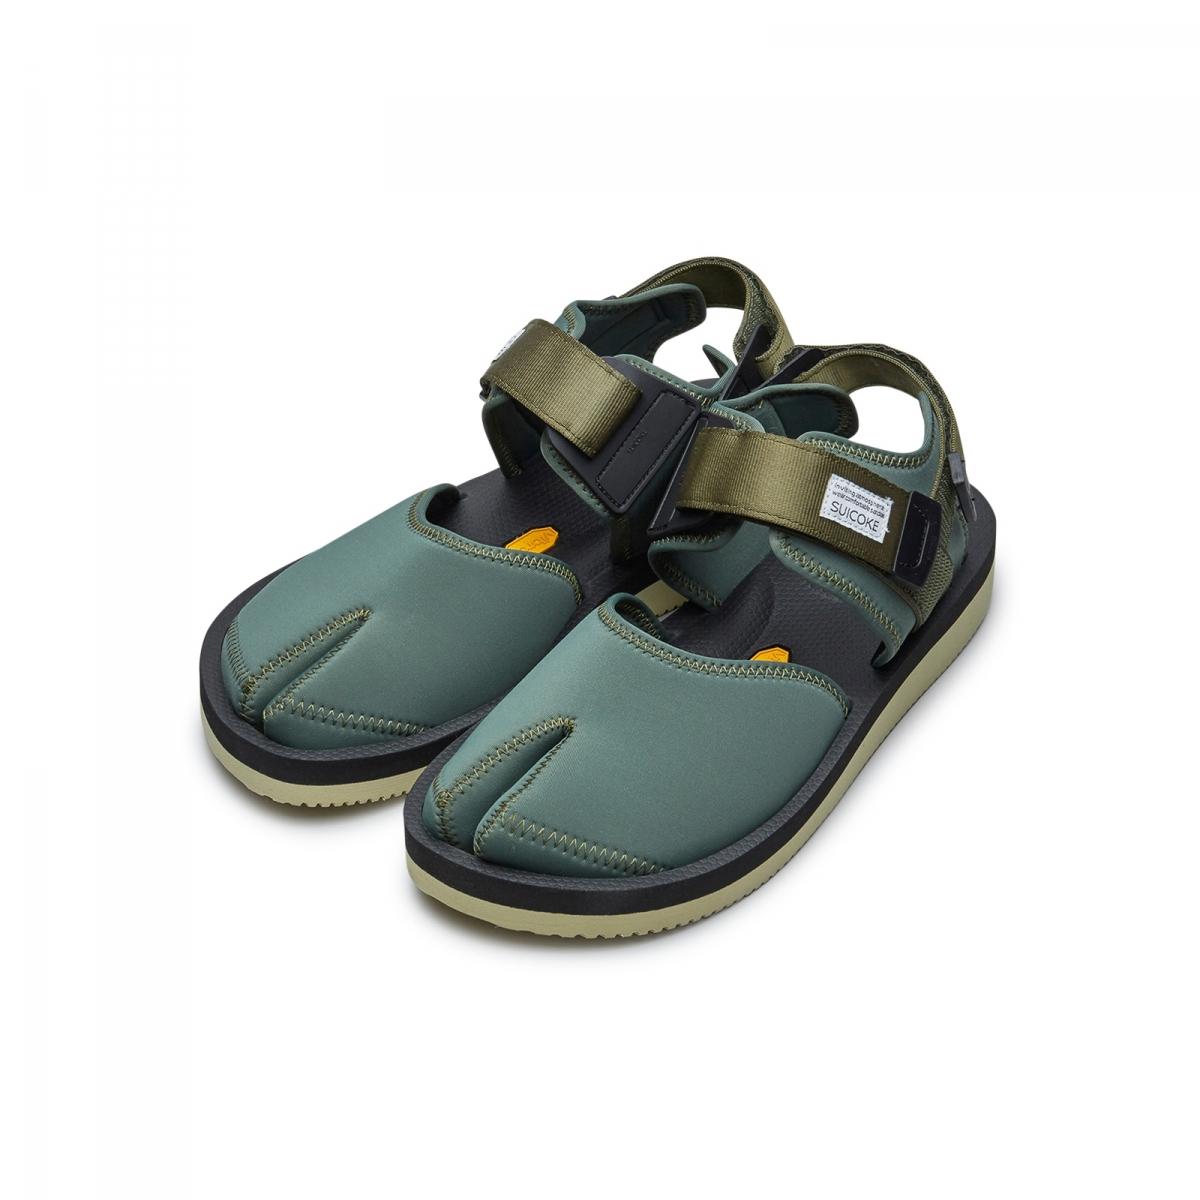 7b7ba4516b58 Suicoke Bita V Sandals in Green for Men - Lyst